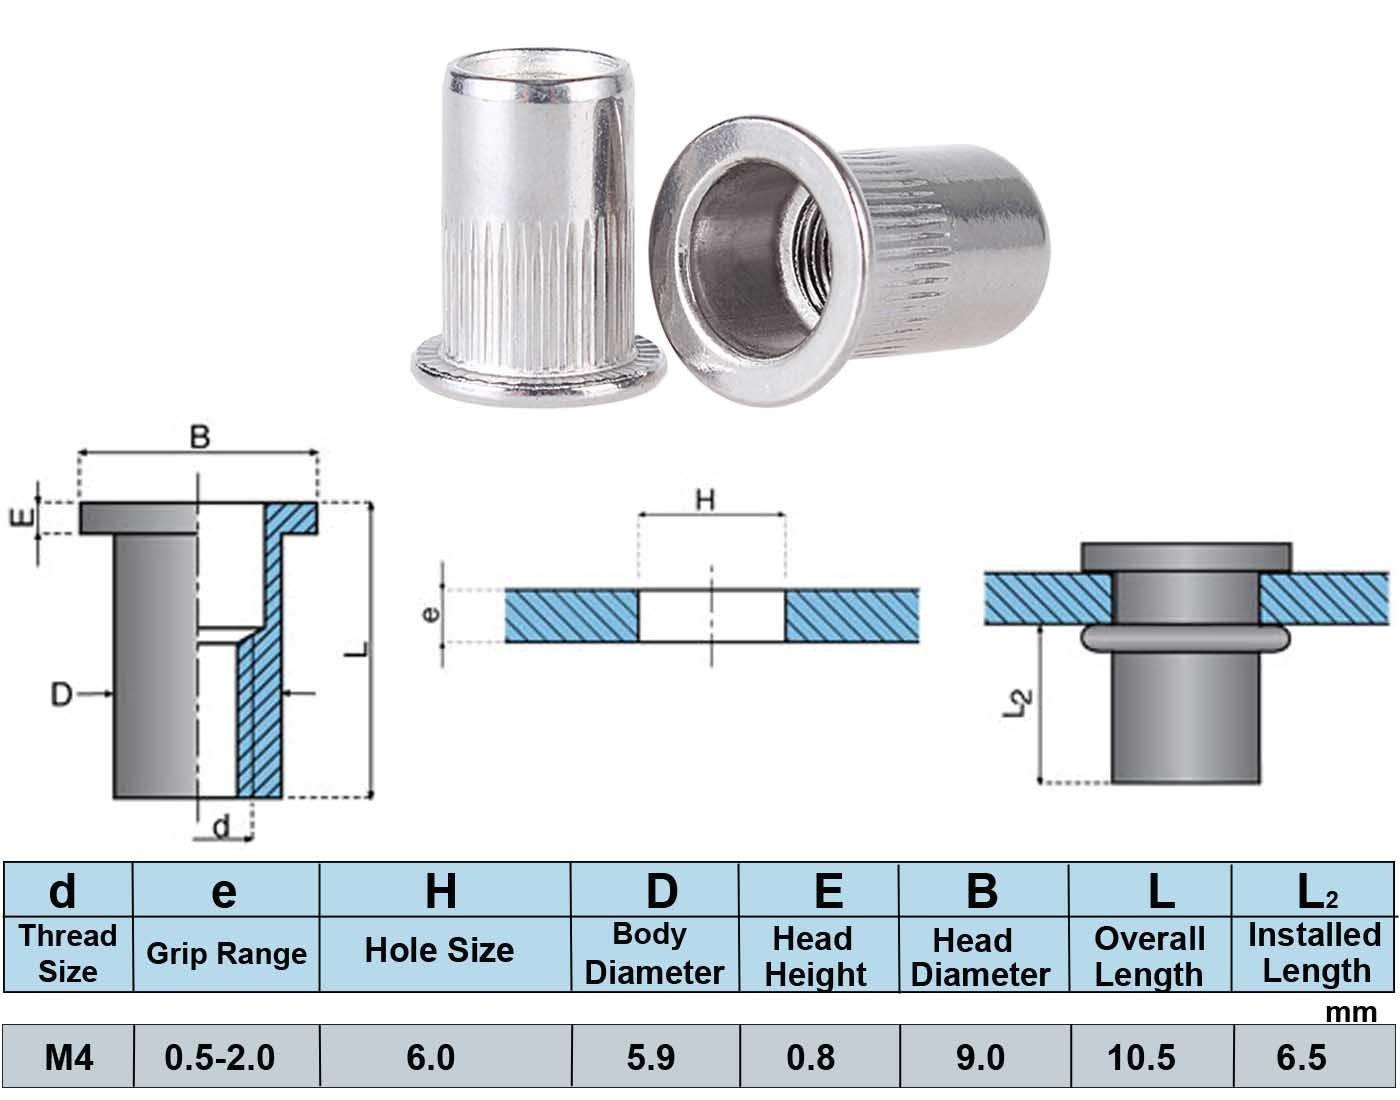 Lyn-Tron Steel Female Zinc Plated Pack of 10 0.312 OD 0.437 Length, 8-32 Screw Size